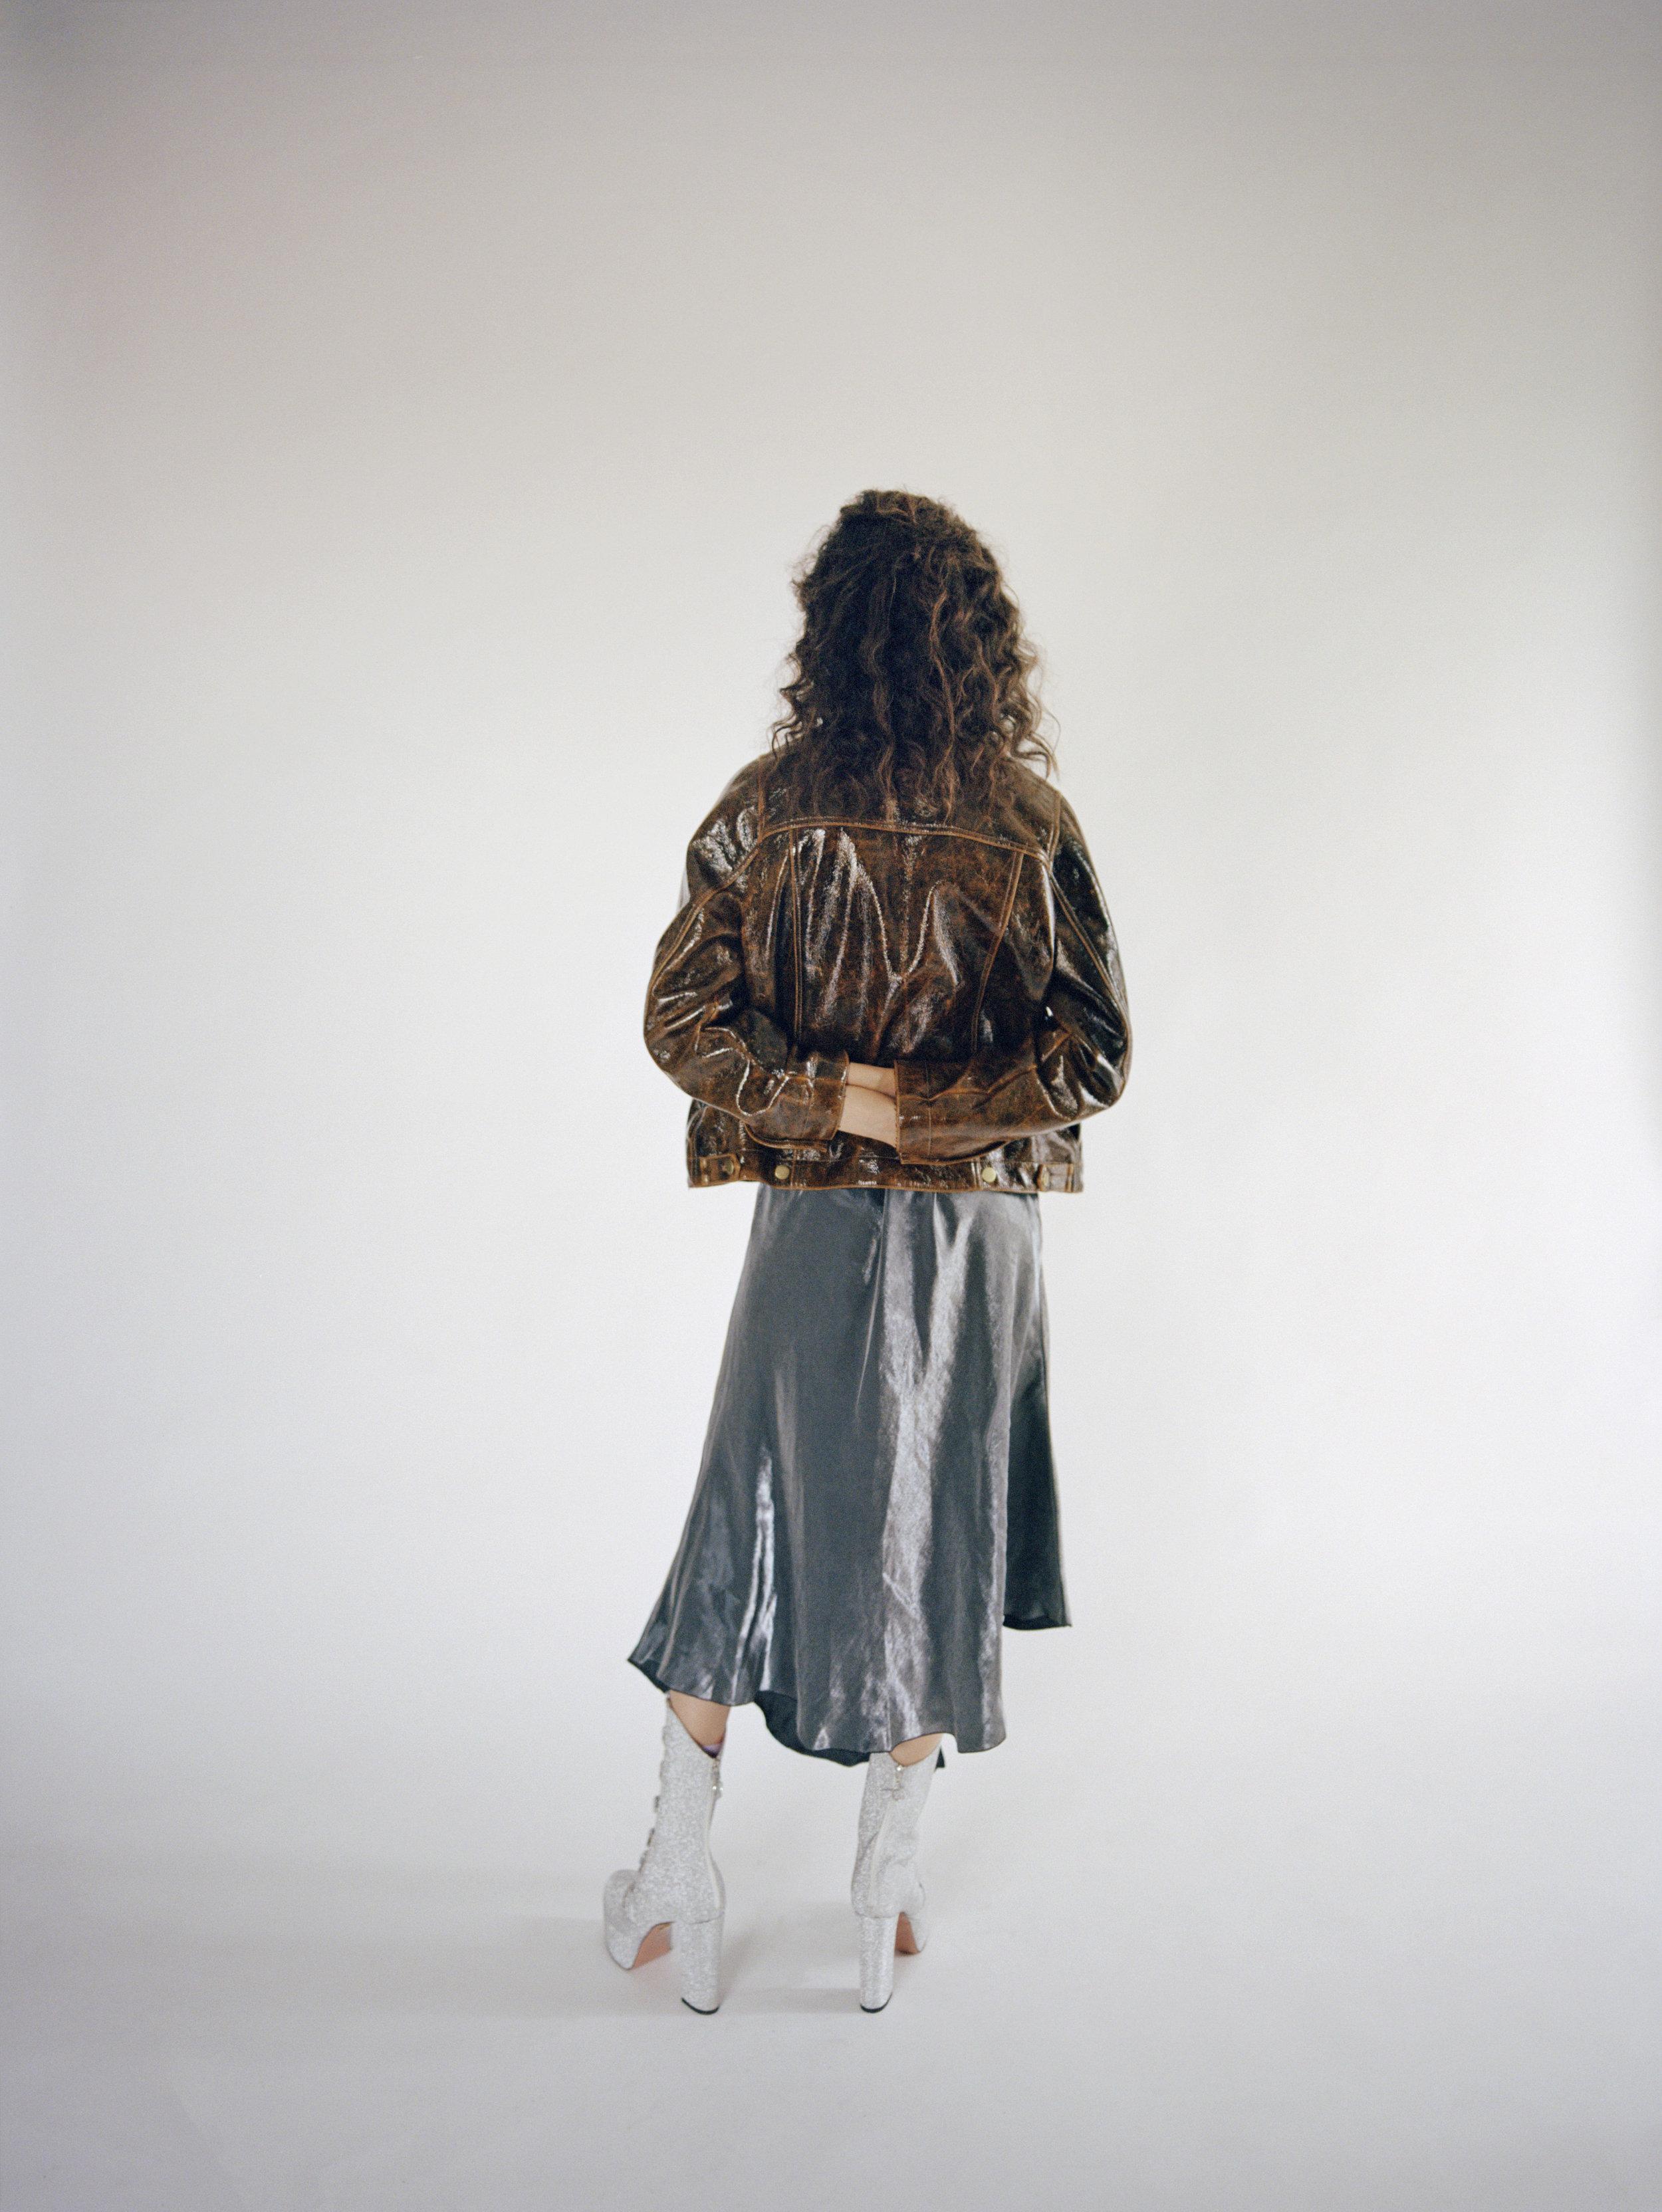 Shirt  FRED PERRY  Dress  BIMBA Y LOLA  Jacket  MOMONÌ  Shoes  JF LONDON